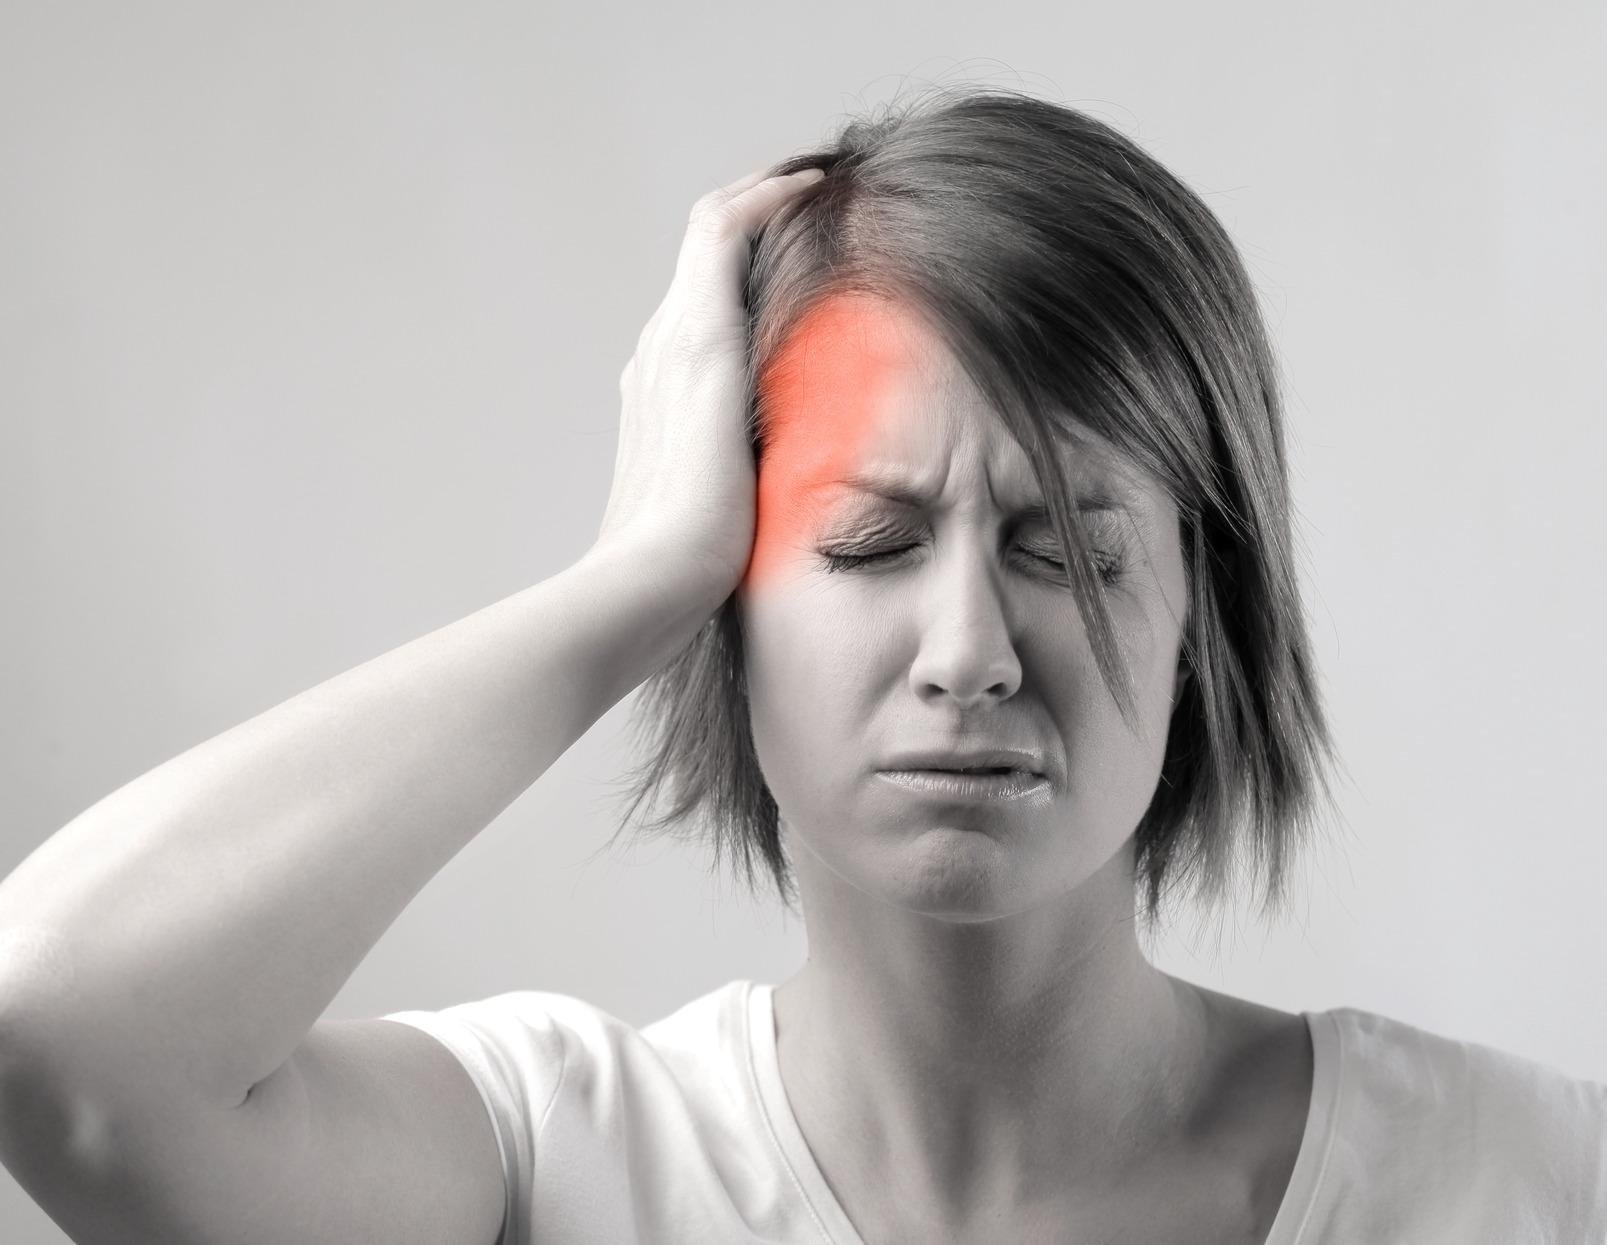 x7-types-of-headaches.jpg.pagespeed.ic.uGW9A0-hYI.jpg